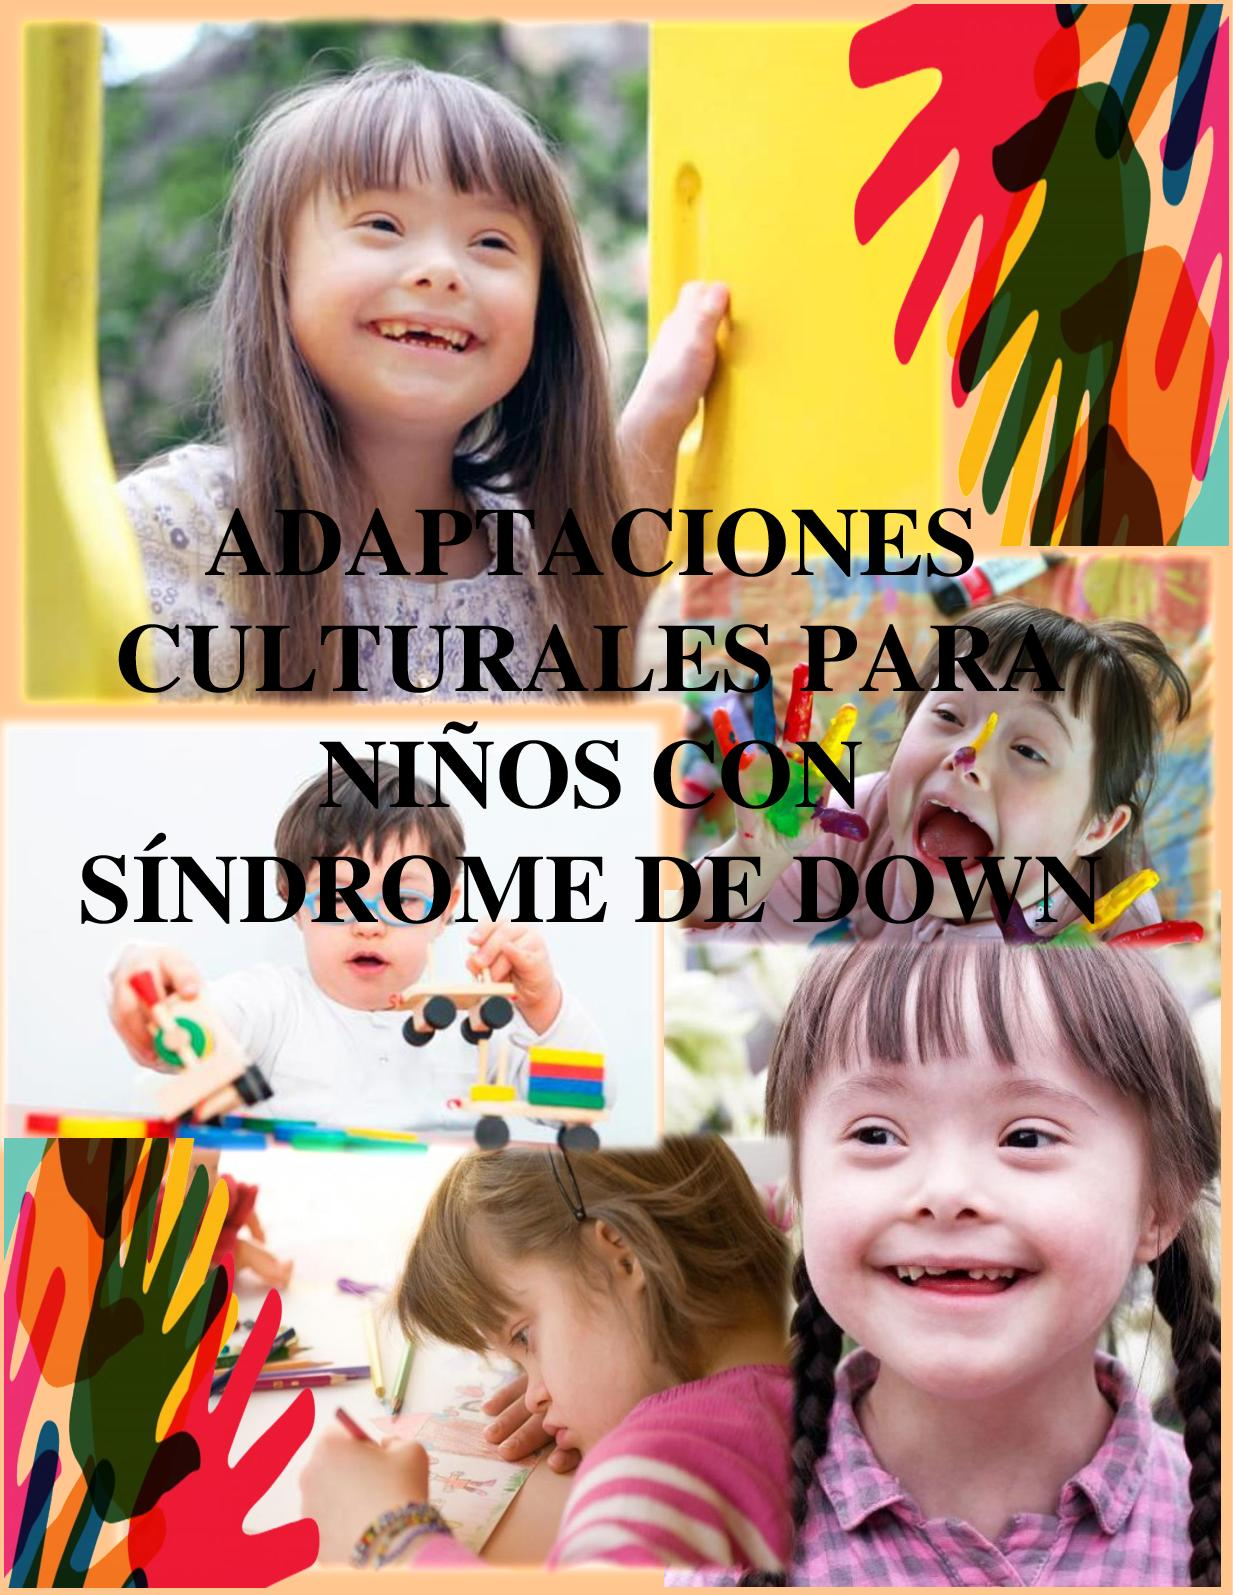 Adactaciones Nereida Moreno Semana 7 2019